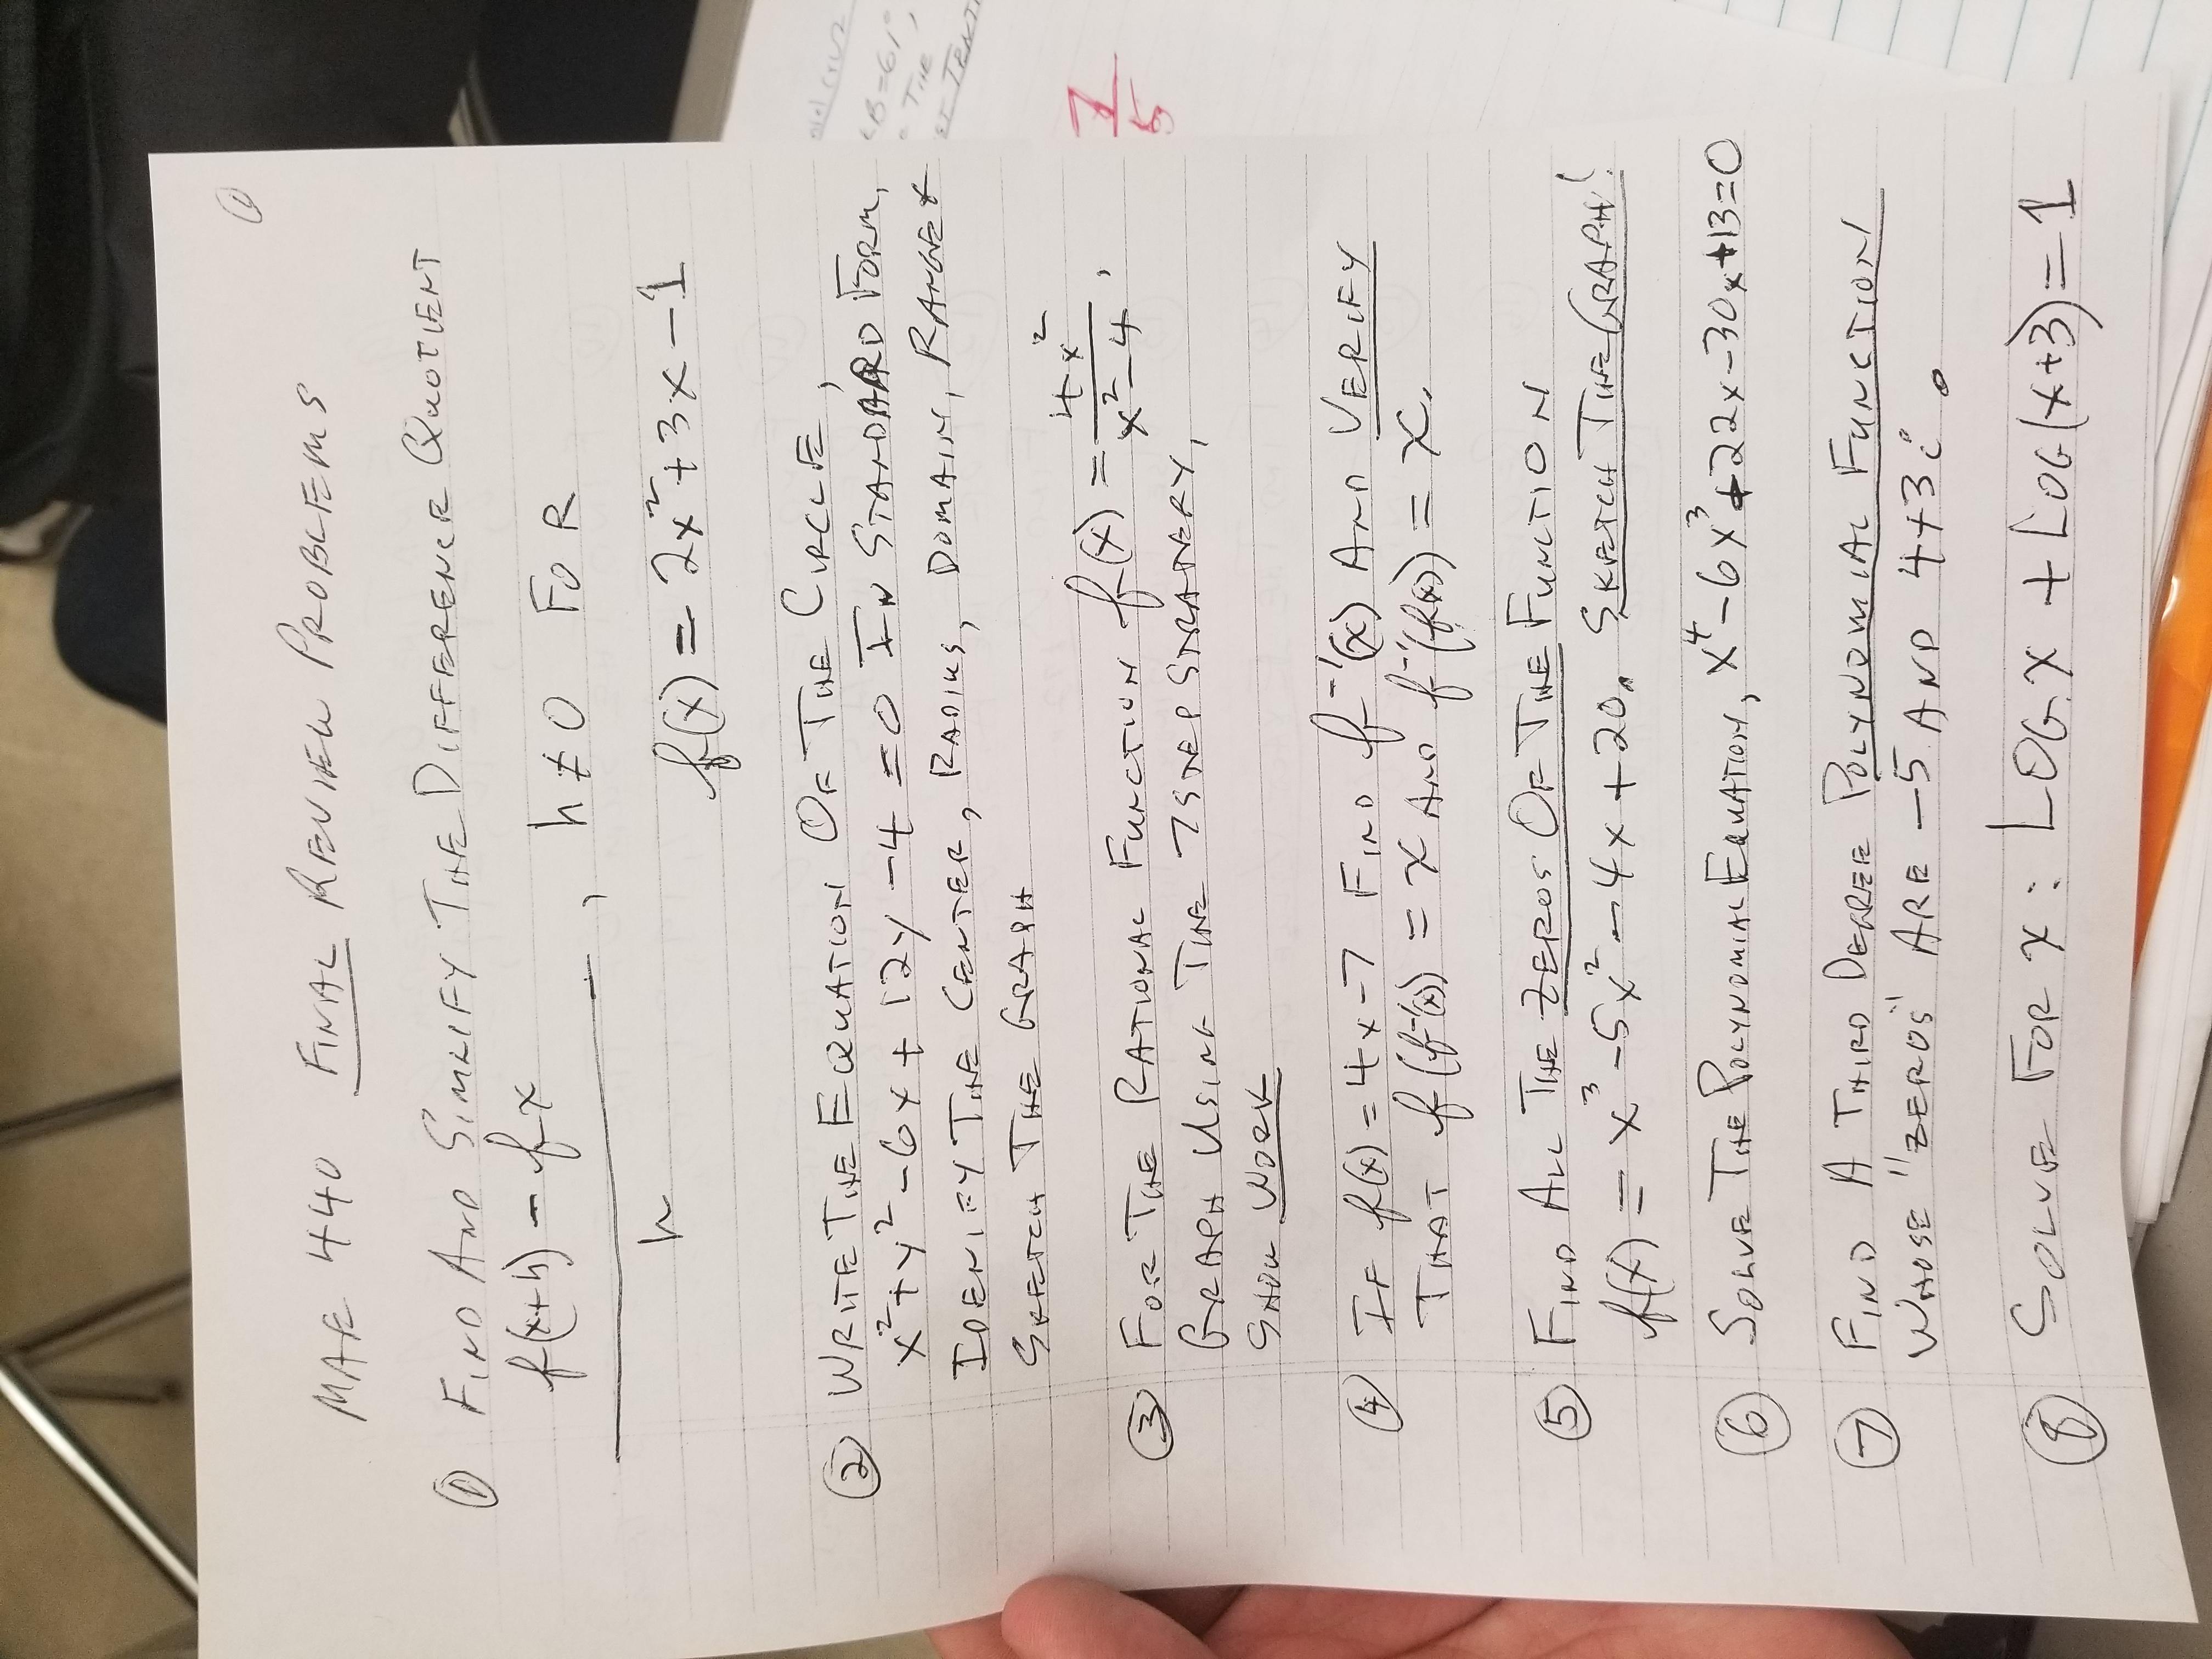 "FINAL REUIEW PROBLEMS MAR 440 QUOTENT O Firo Aro SimeIFy Tfe DifFEREweR h £o Fo R 2x73x-1 f0)= WRITE THE EQUATION Of Tue CircLE xtyt-Gy+ 12y -4 =0 In STADARD ORM, IDENIFY Teme CENTERR2 CRCLFE niel cru B=61 RAMafet , IDeniFy Tne CanTER, RADIKS, SKFETCH TH€ GRAPH DOMAIN (ZANIKS Tit Ko) 3 Fose TuE RATIONAL FurcTIUN 5 BeAeH Usiar Tiae 7sse p SreAnERy, f6) Arn VERLEY ) If RG)=4x-7 Fino f G) Arn =X Amo ff) = X (Rs) fiR))3Dx, TimAT f) 5 Fue ALL TiHE ZEROS CF TME FuncTION -4x+20, Skereu Tue CRALA! HA=x it X'-6x422x-30x+13=0 6 SonvR The PoeYNaMIAL EauATON, NDMIAL FIND A THIRD DEARER OLYNOW IAL FUNCTION! Woto SE ""ZEROS ARE -5 AND 4+3 ¿ o Le O Sowe FOR x: L OG.X + LoGl+3)=1"